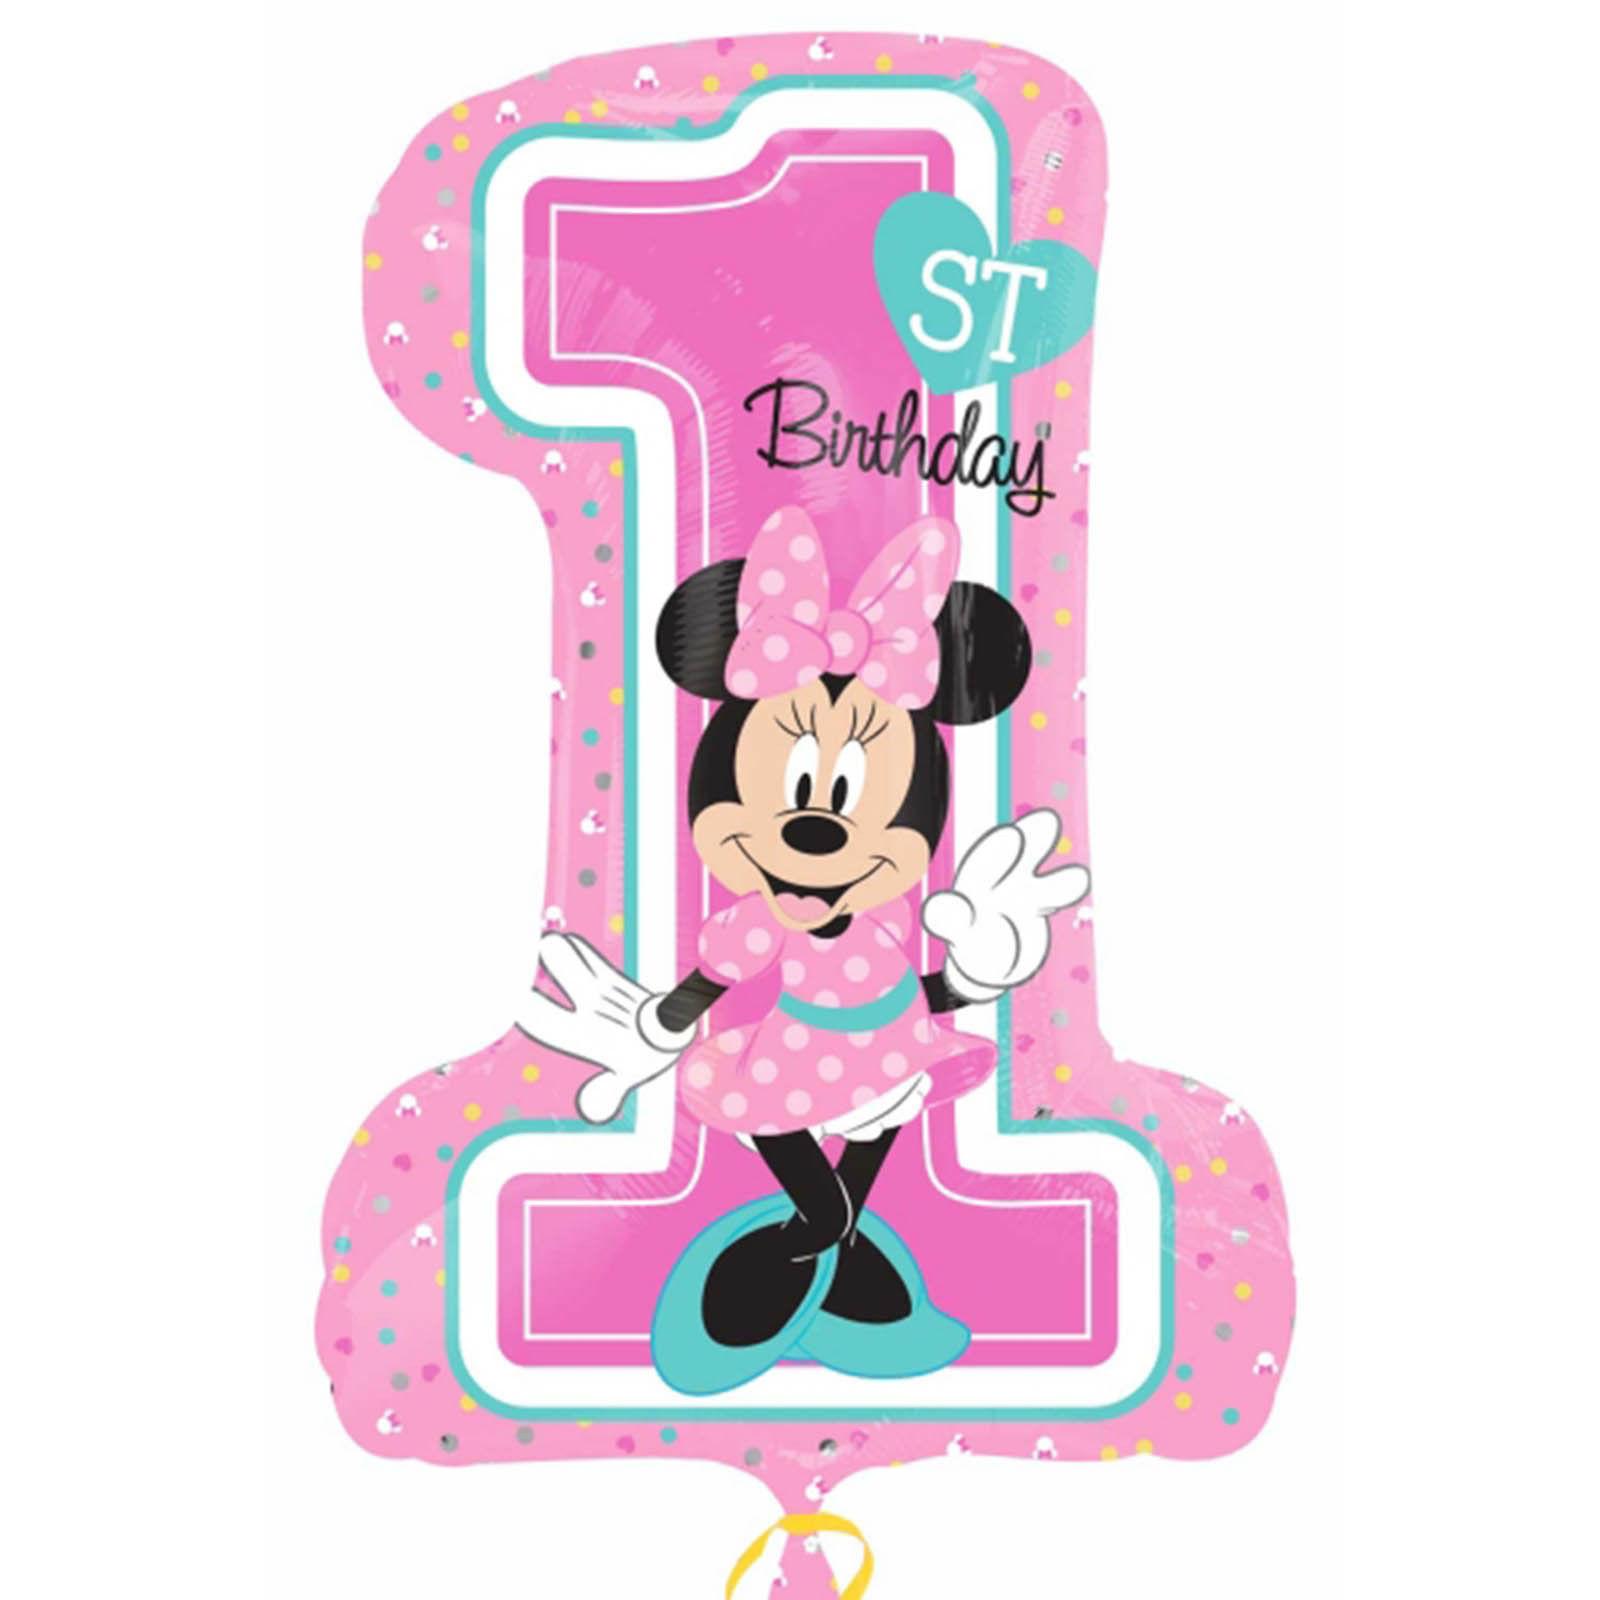 Minnie Mouse - 1st Birthday - Super Shape - Foil Balloon | Balloon Shop